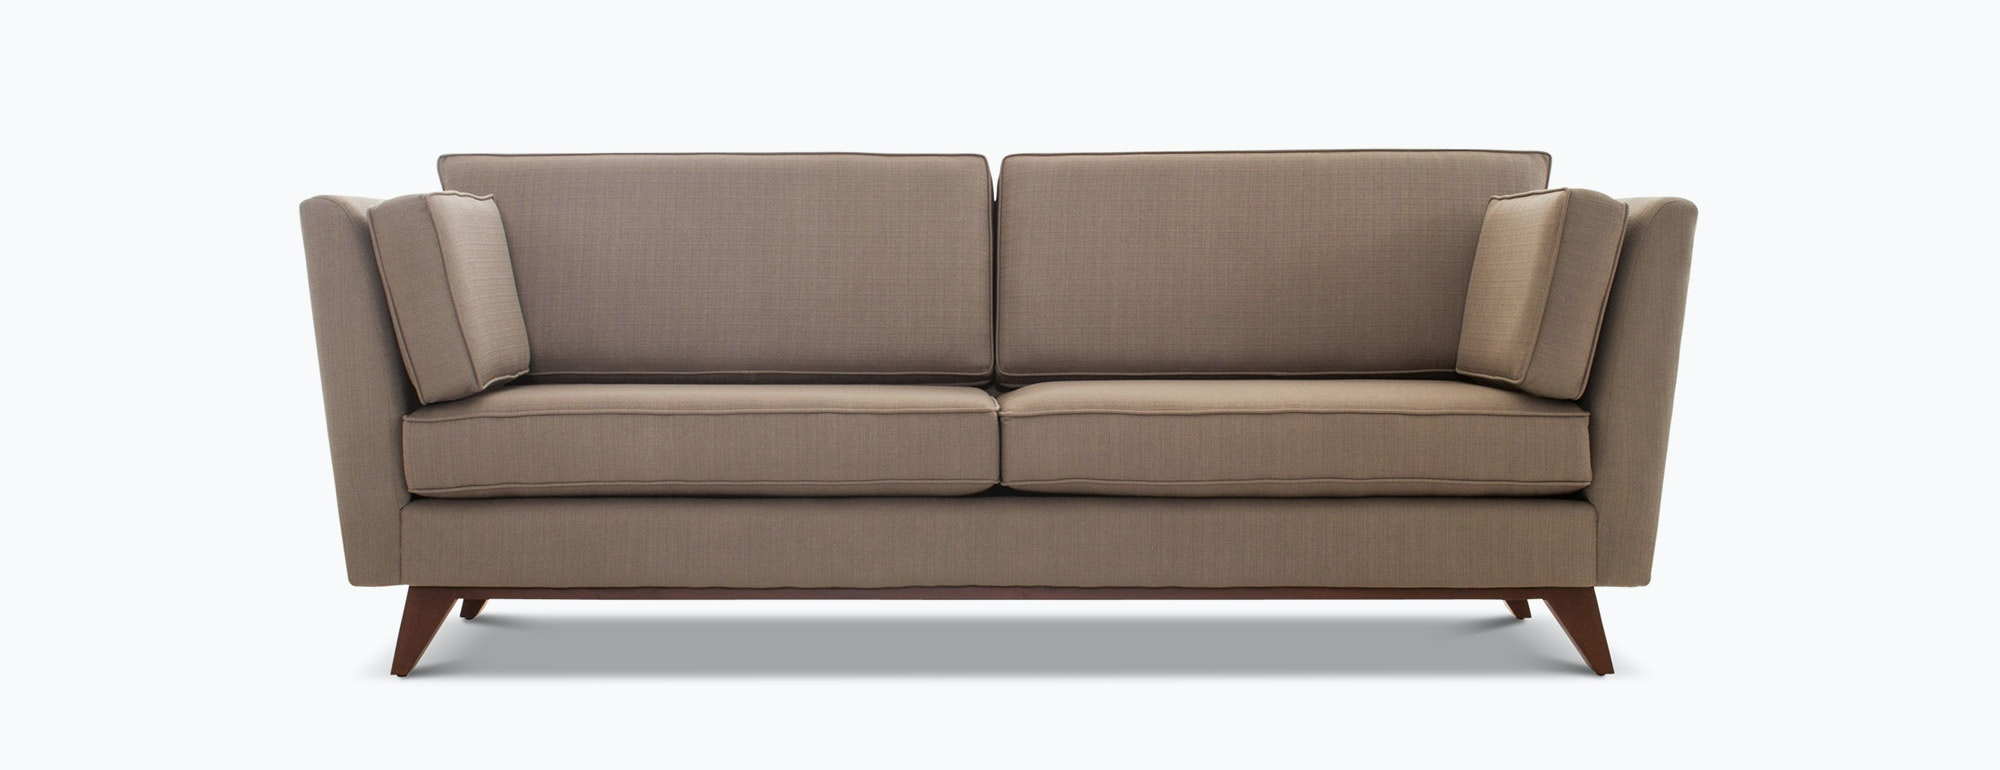 Roller sofa joybird for Roller wohnzimmer couch